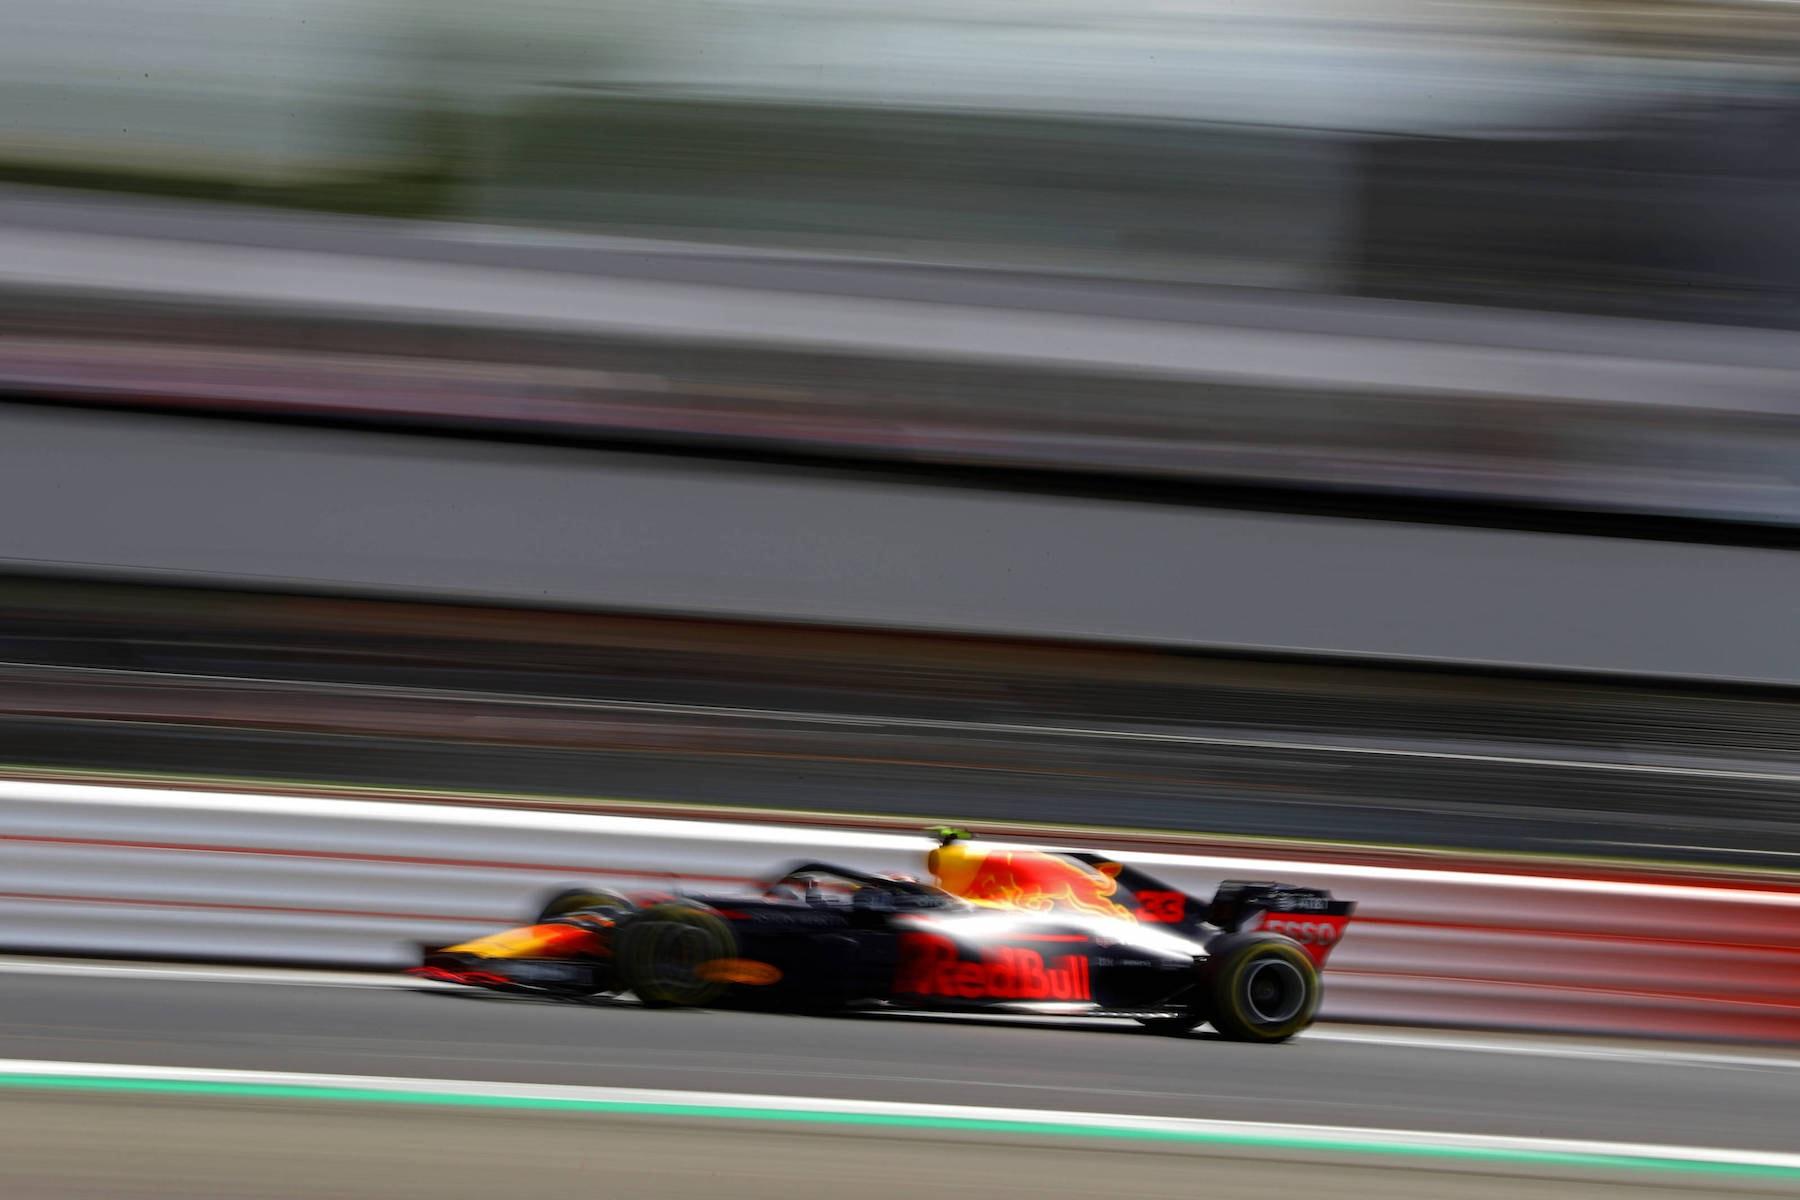 H 2018 Max Verstappen | Red Bull RB14 | 2018 British GP 2 copy.jpg